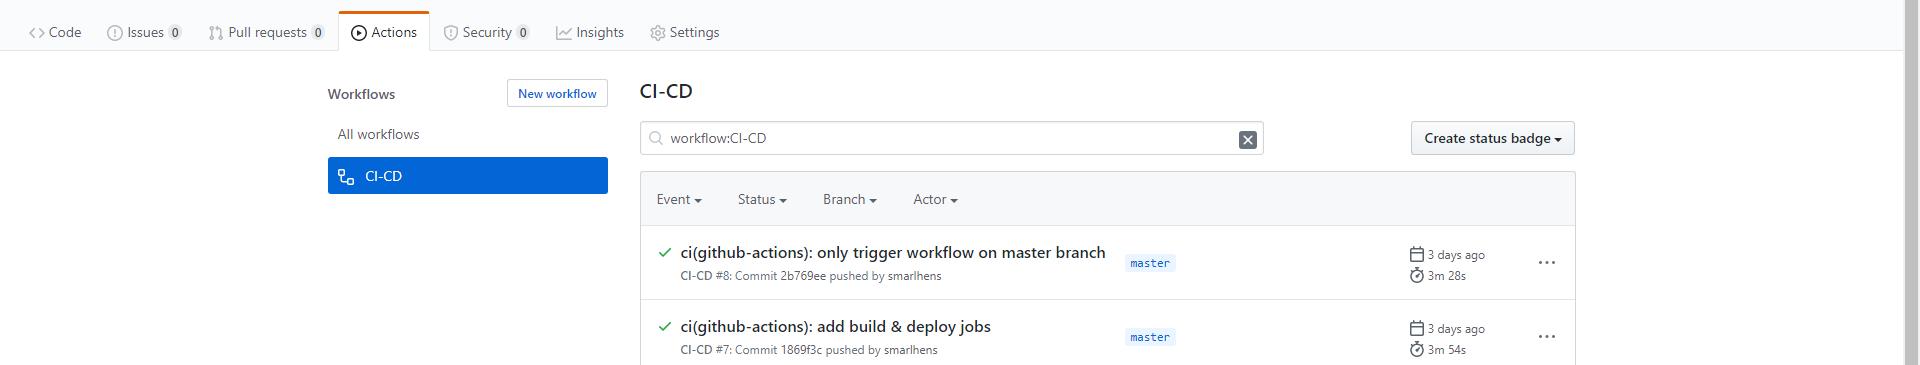 github_actions_workflow_ci_cd